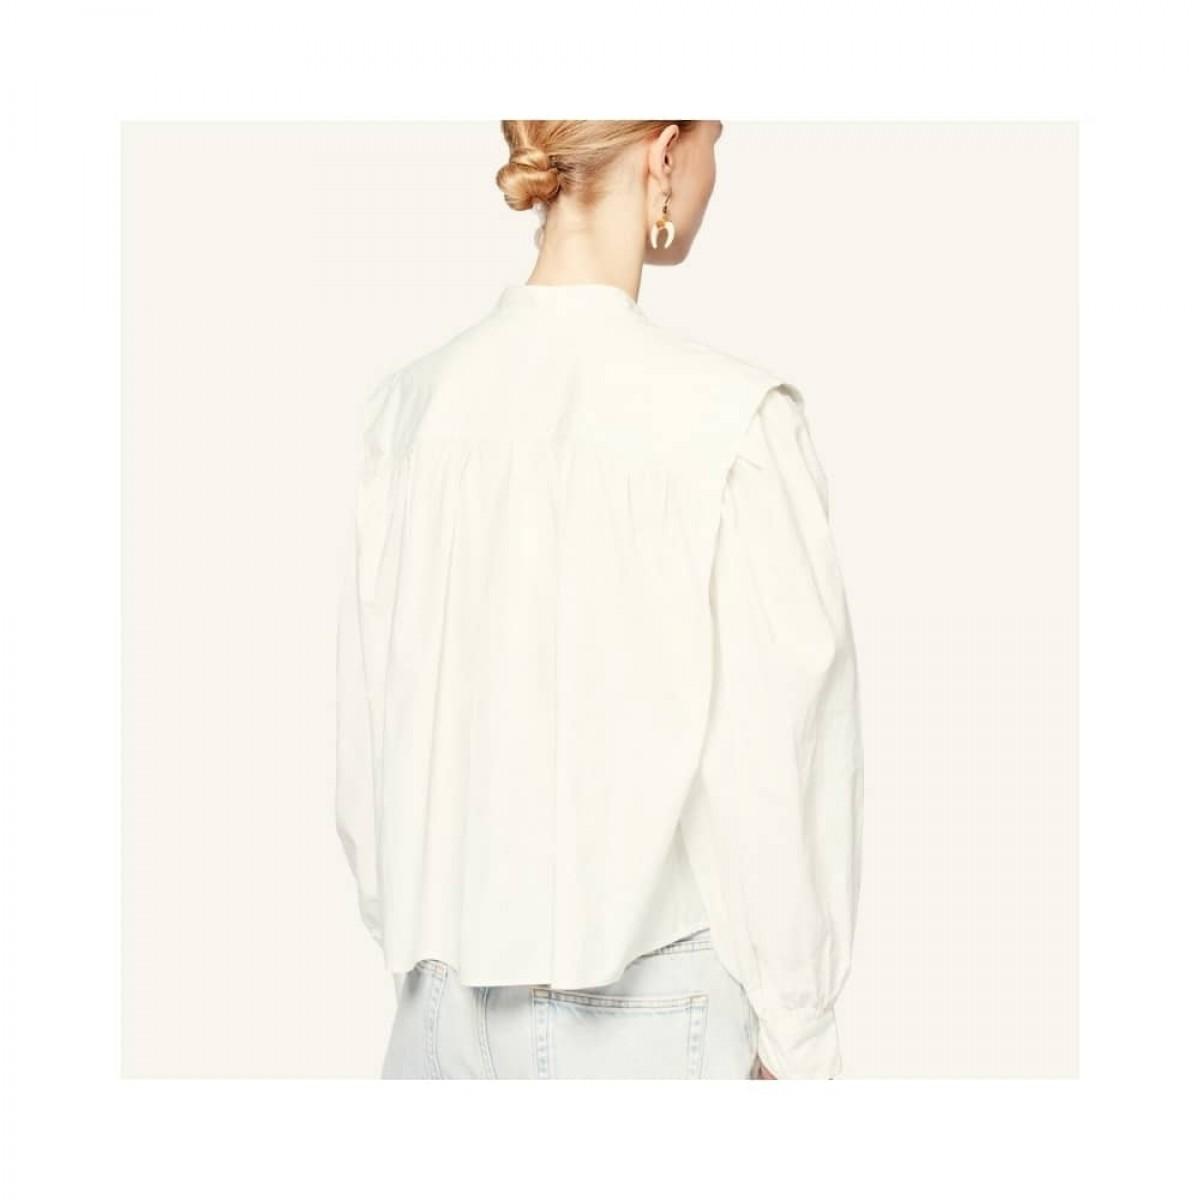 okina top - white - model ryg